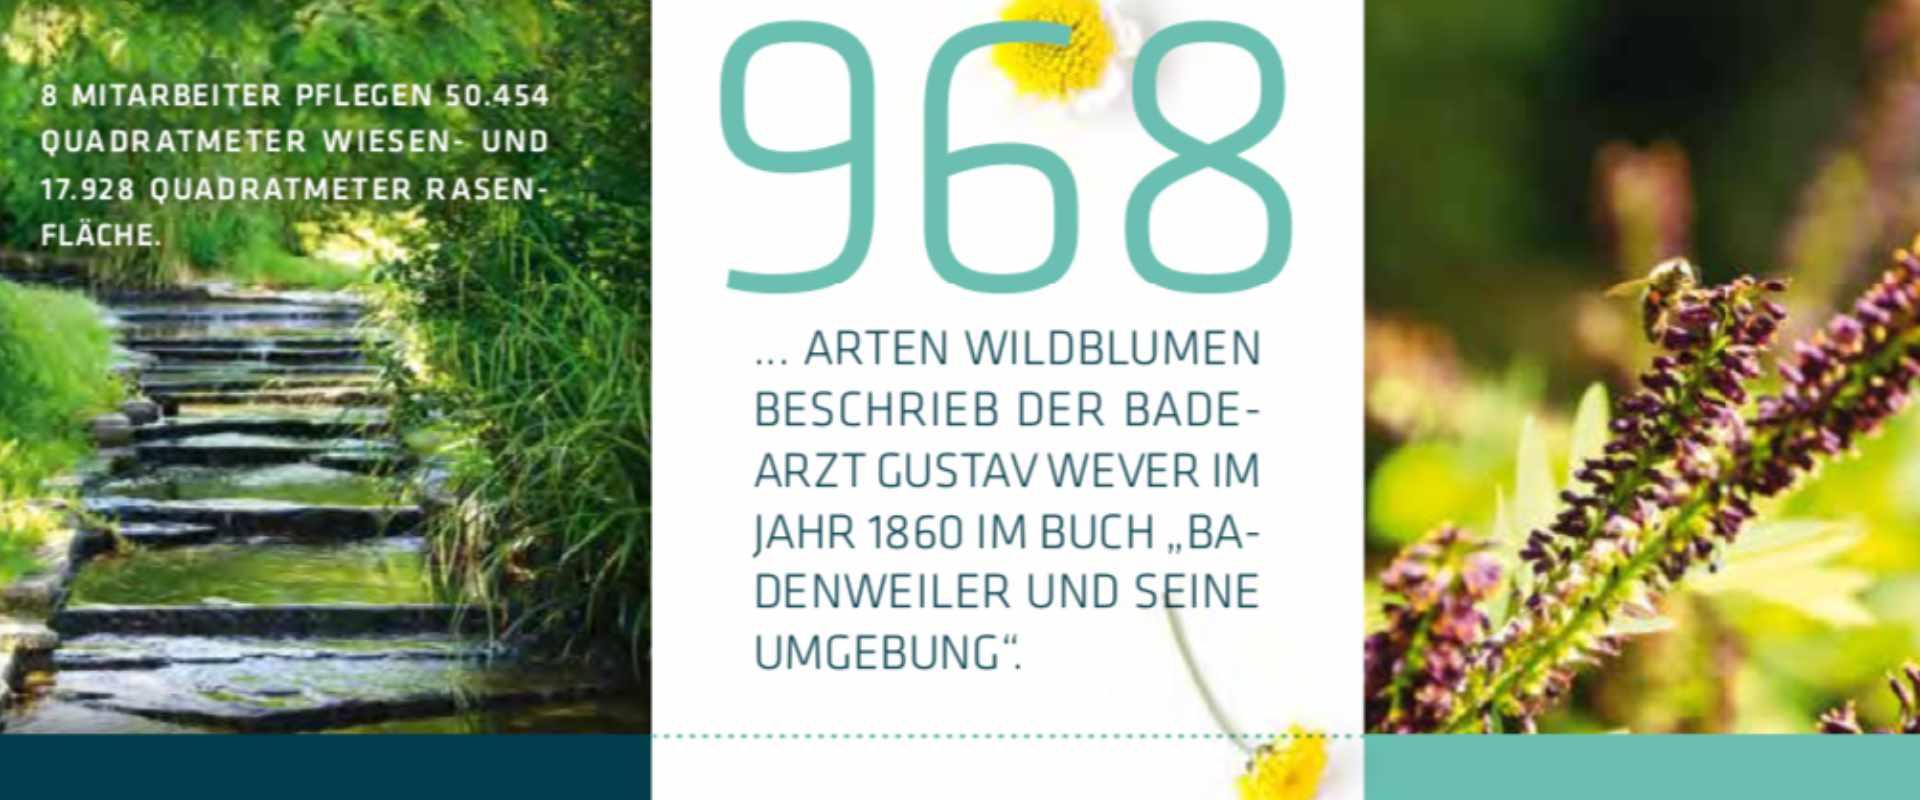 Übrigens, Badenweiler